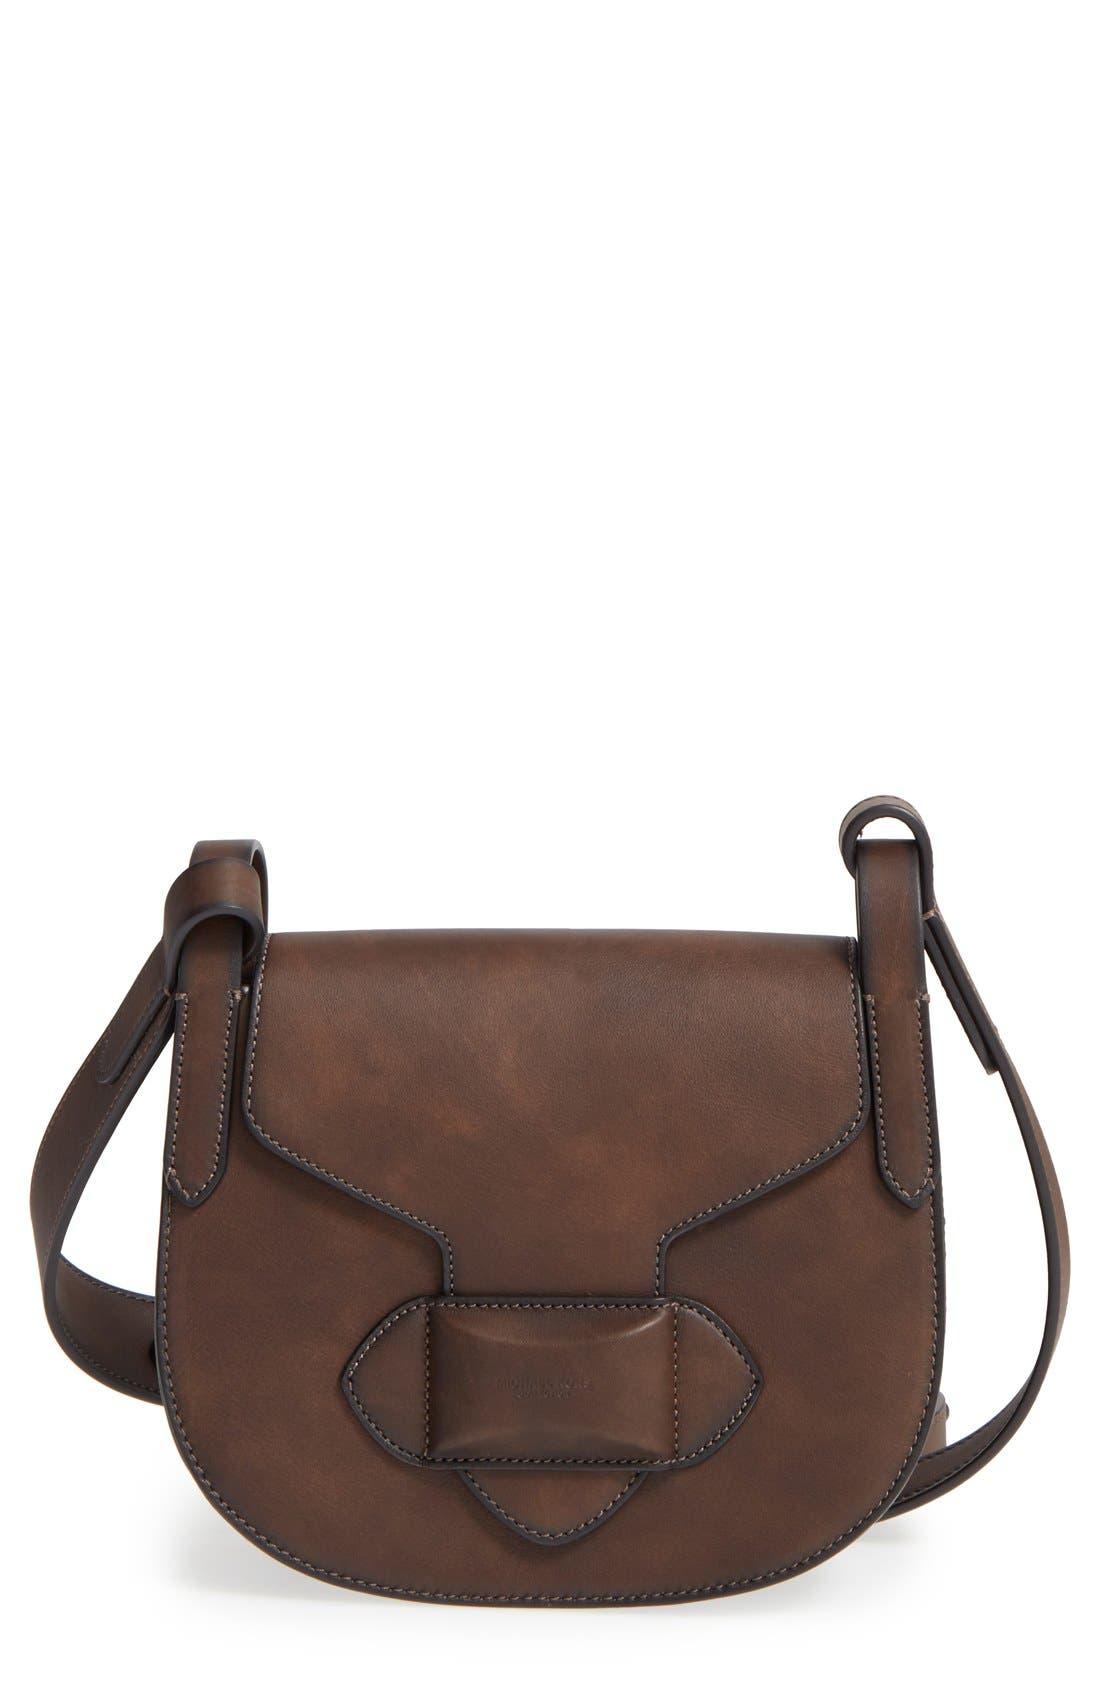 Main Image - Michael Kors 'Daria' Leather Saddle Bag